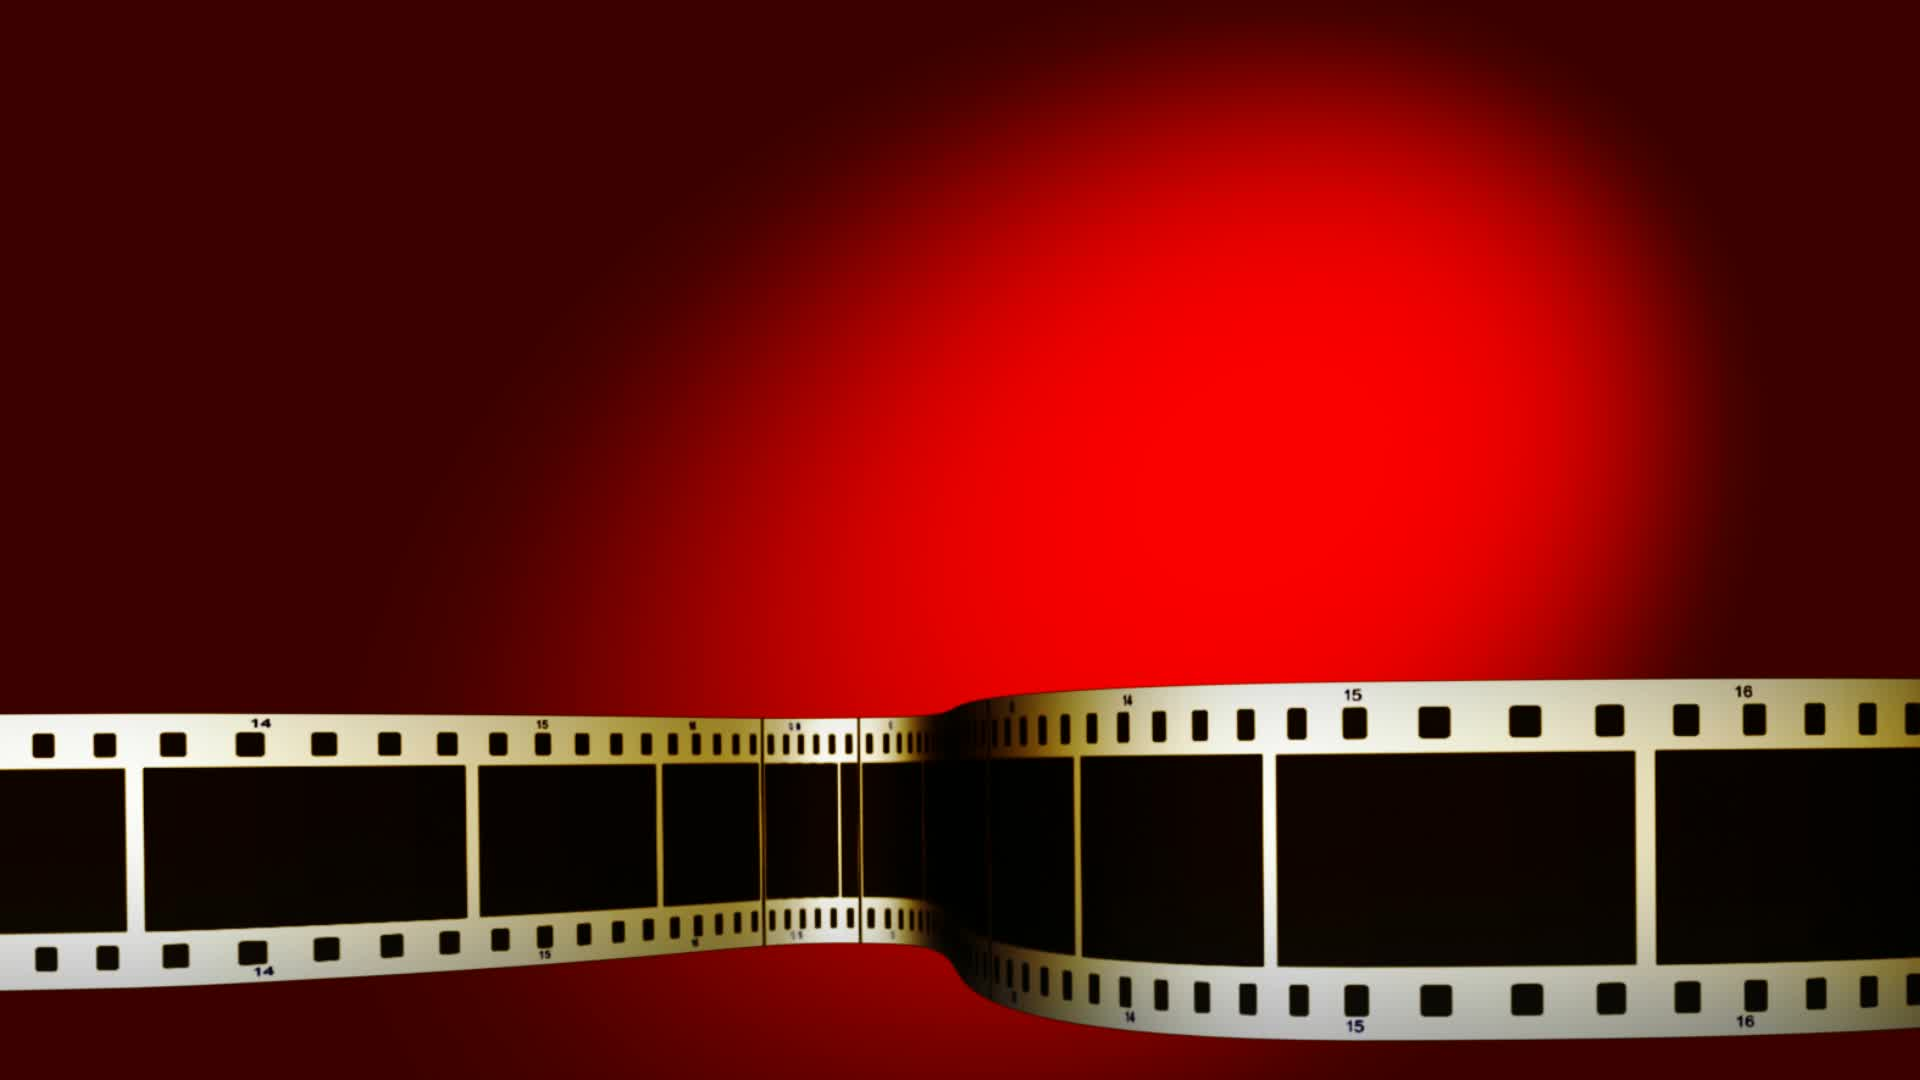 Video Filmstrip lower thirds red background 20614809 1920x1080